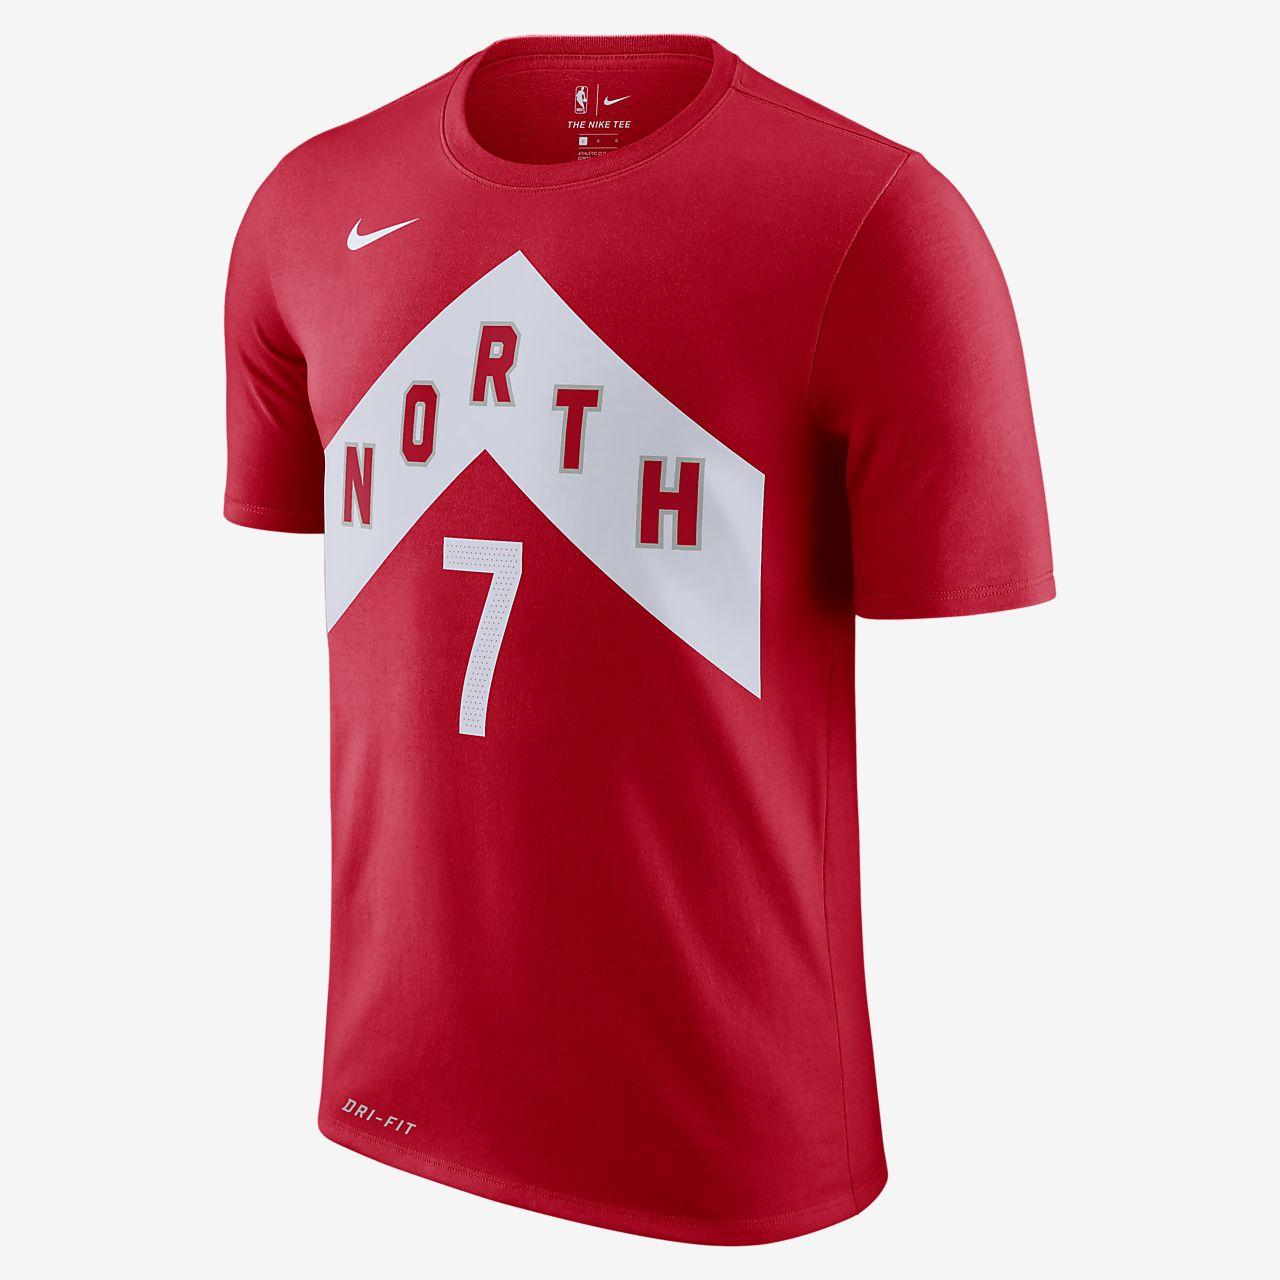 574ccb04a95 Kyle Lowry Toronto Raptors City Edition Nike Dri-FIT Men s NBA T ...